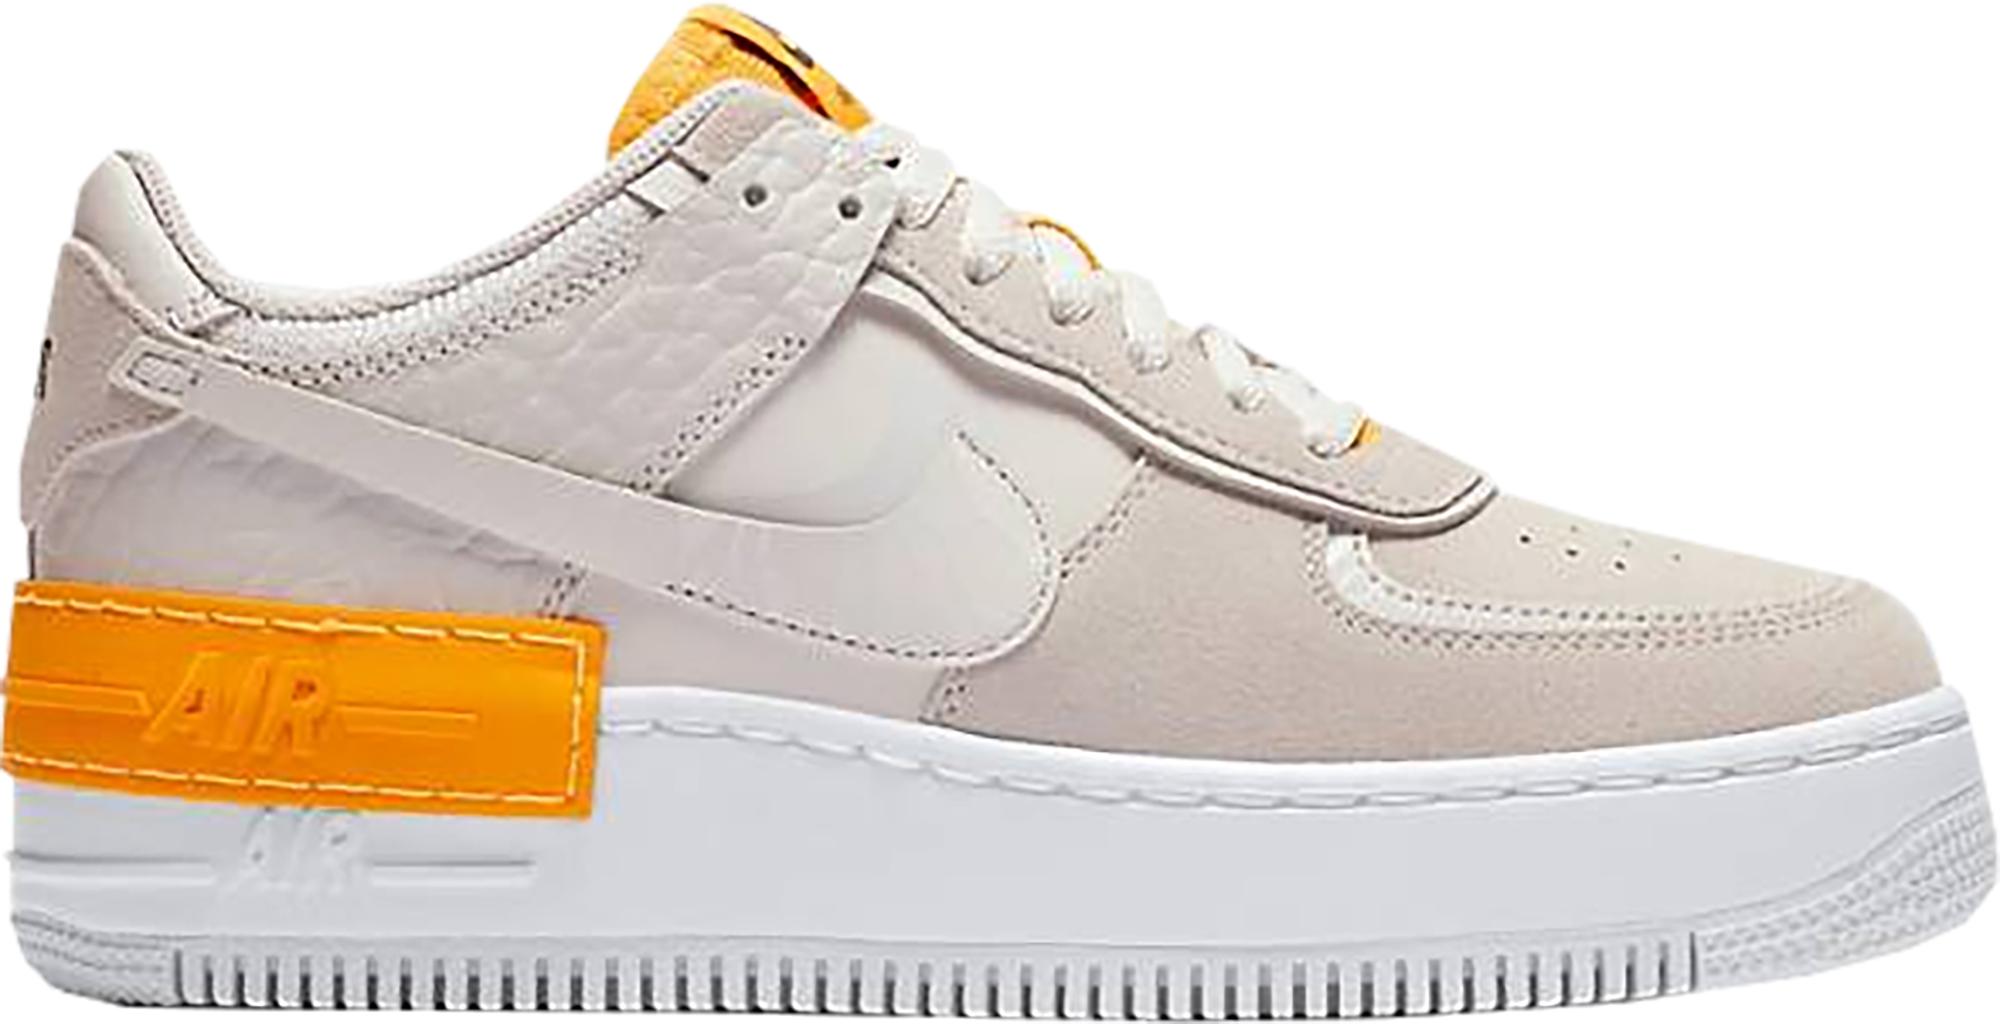 Nike Air Force 1 Shadow Vast Grey Laser